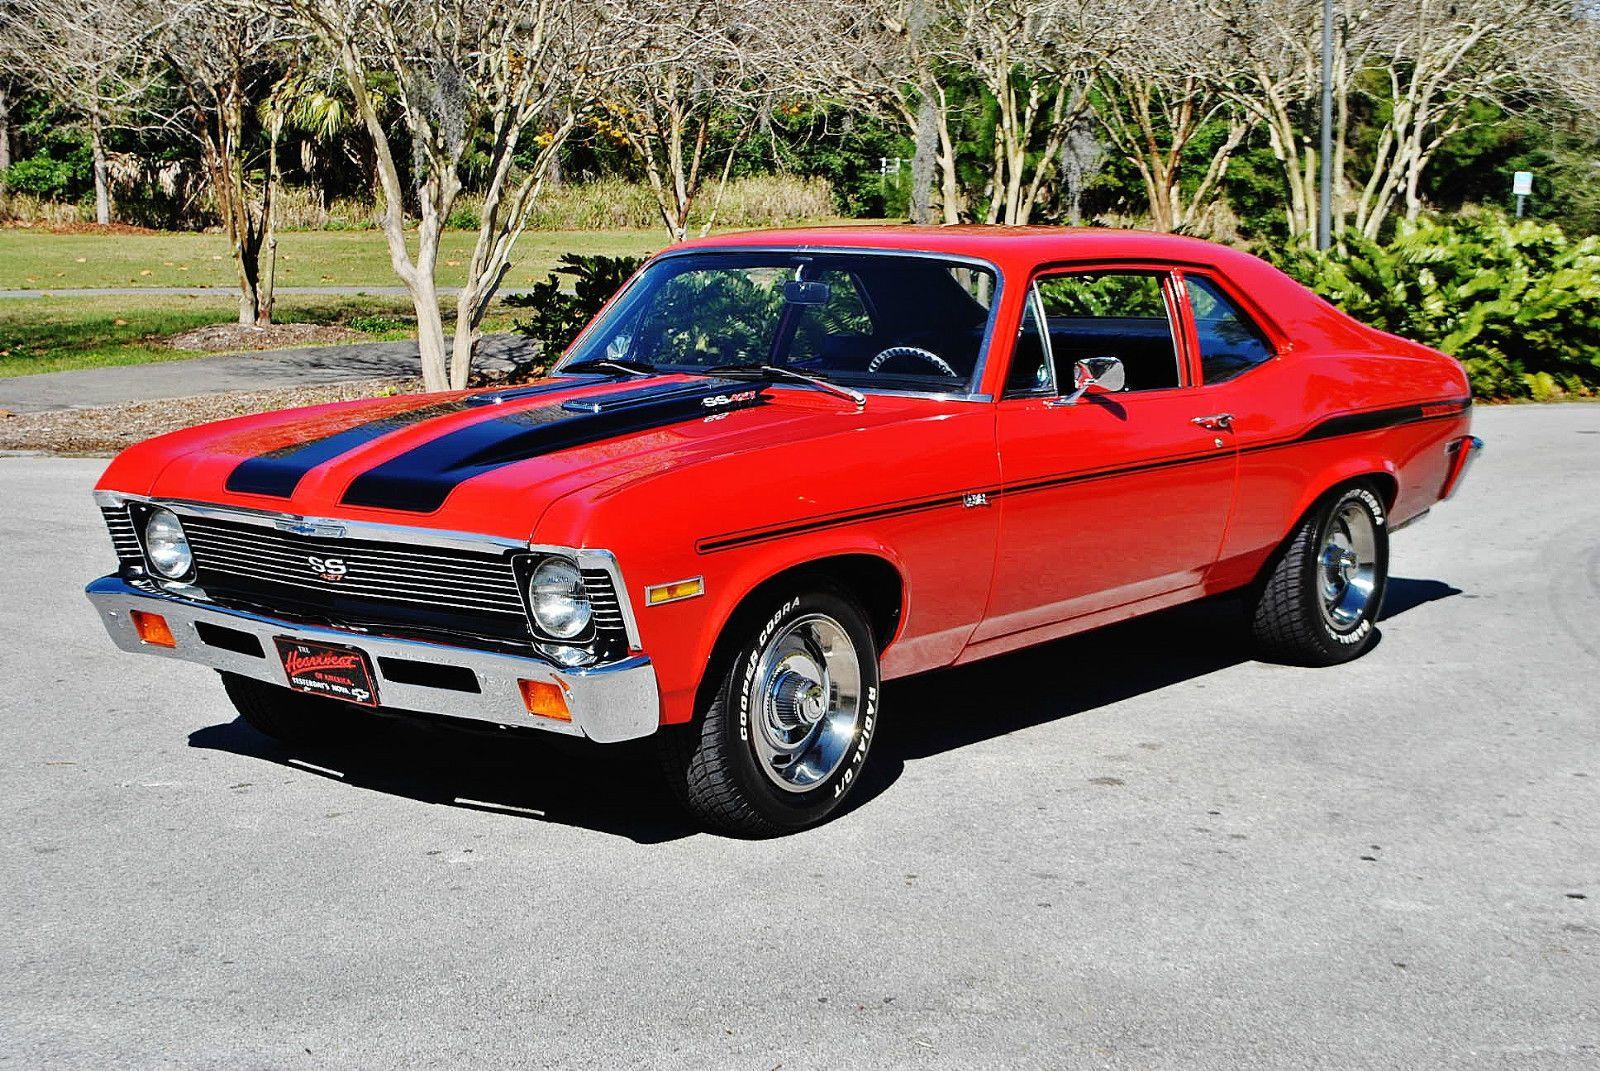 1971 Chevrolet Nova 427 Big Block Found On Bing From Classicvehicleslist Com Chevy Nova Chevrolet Nova Chevy